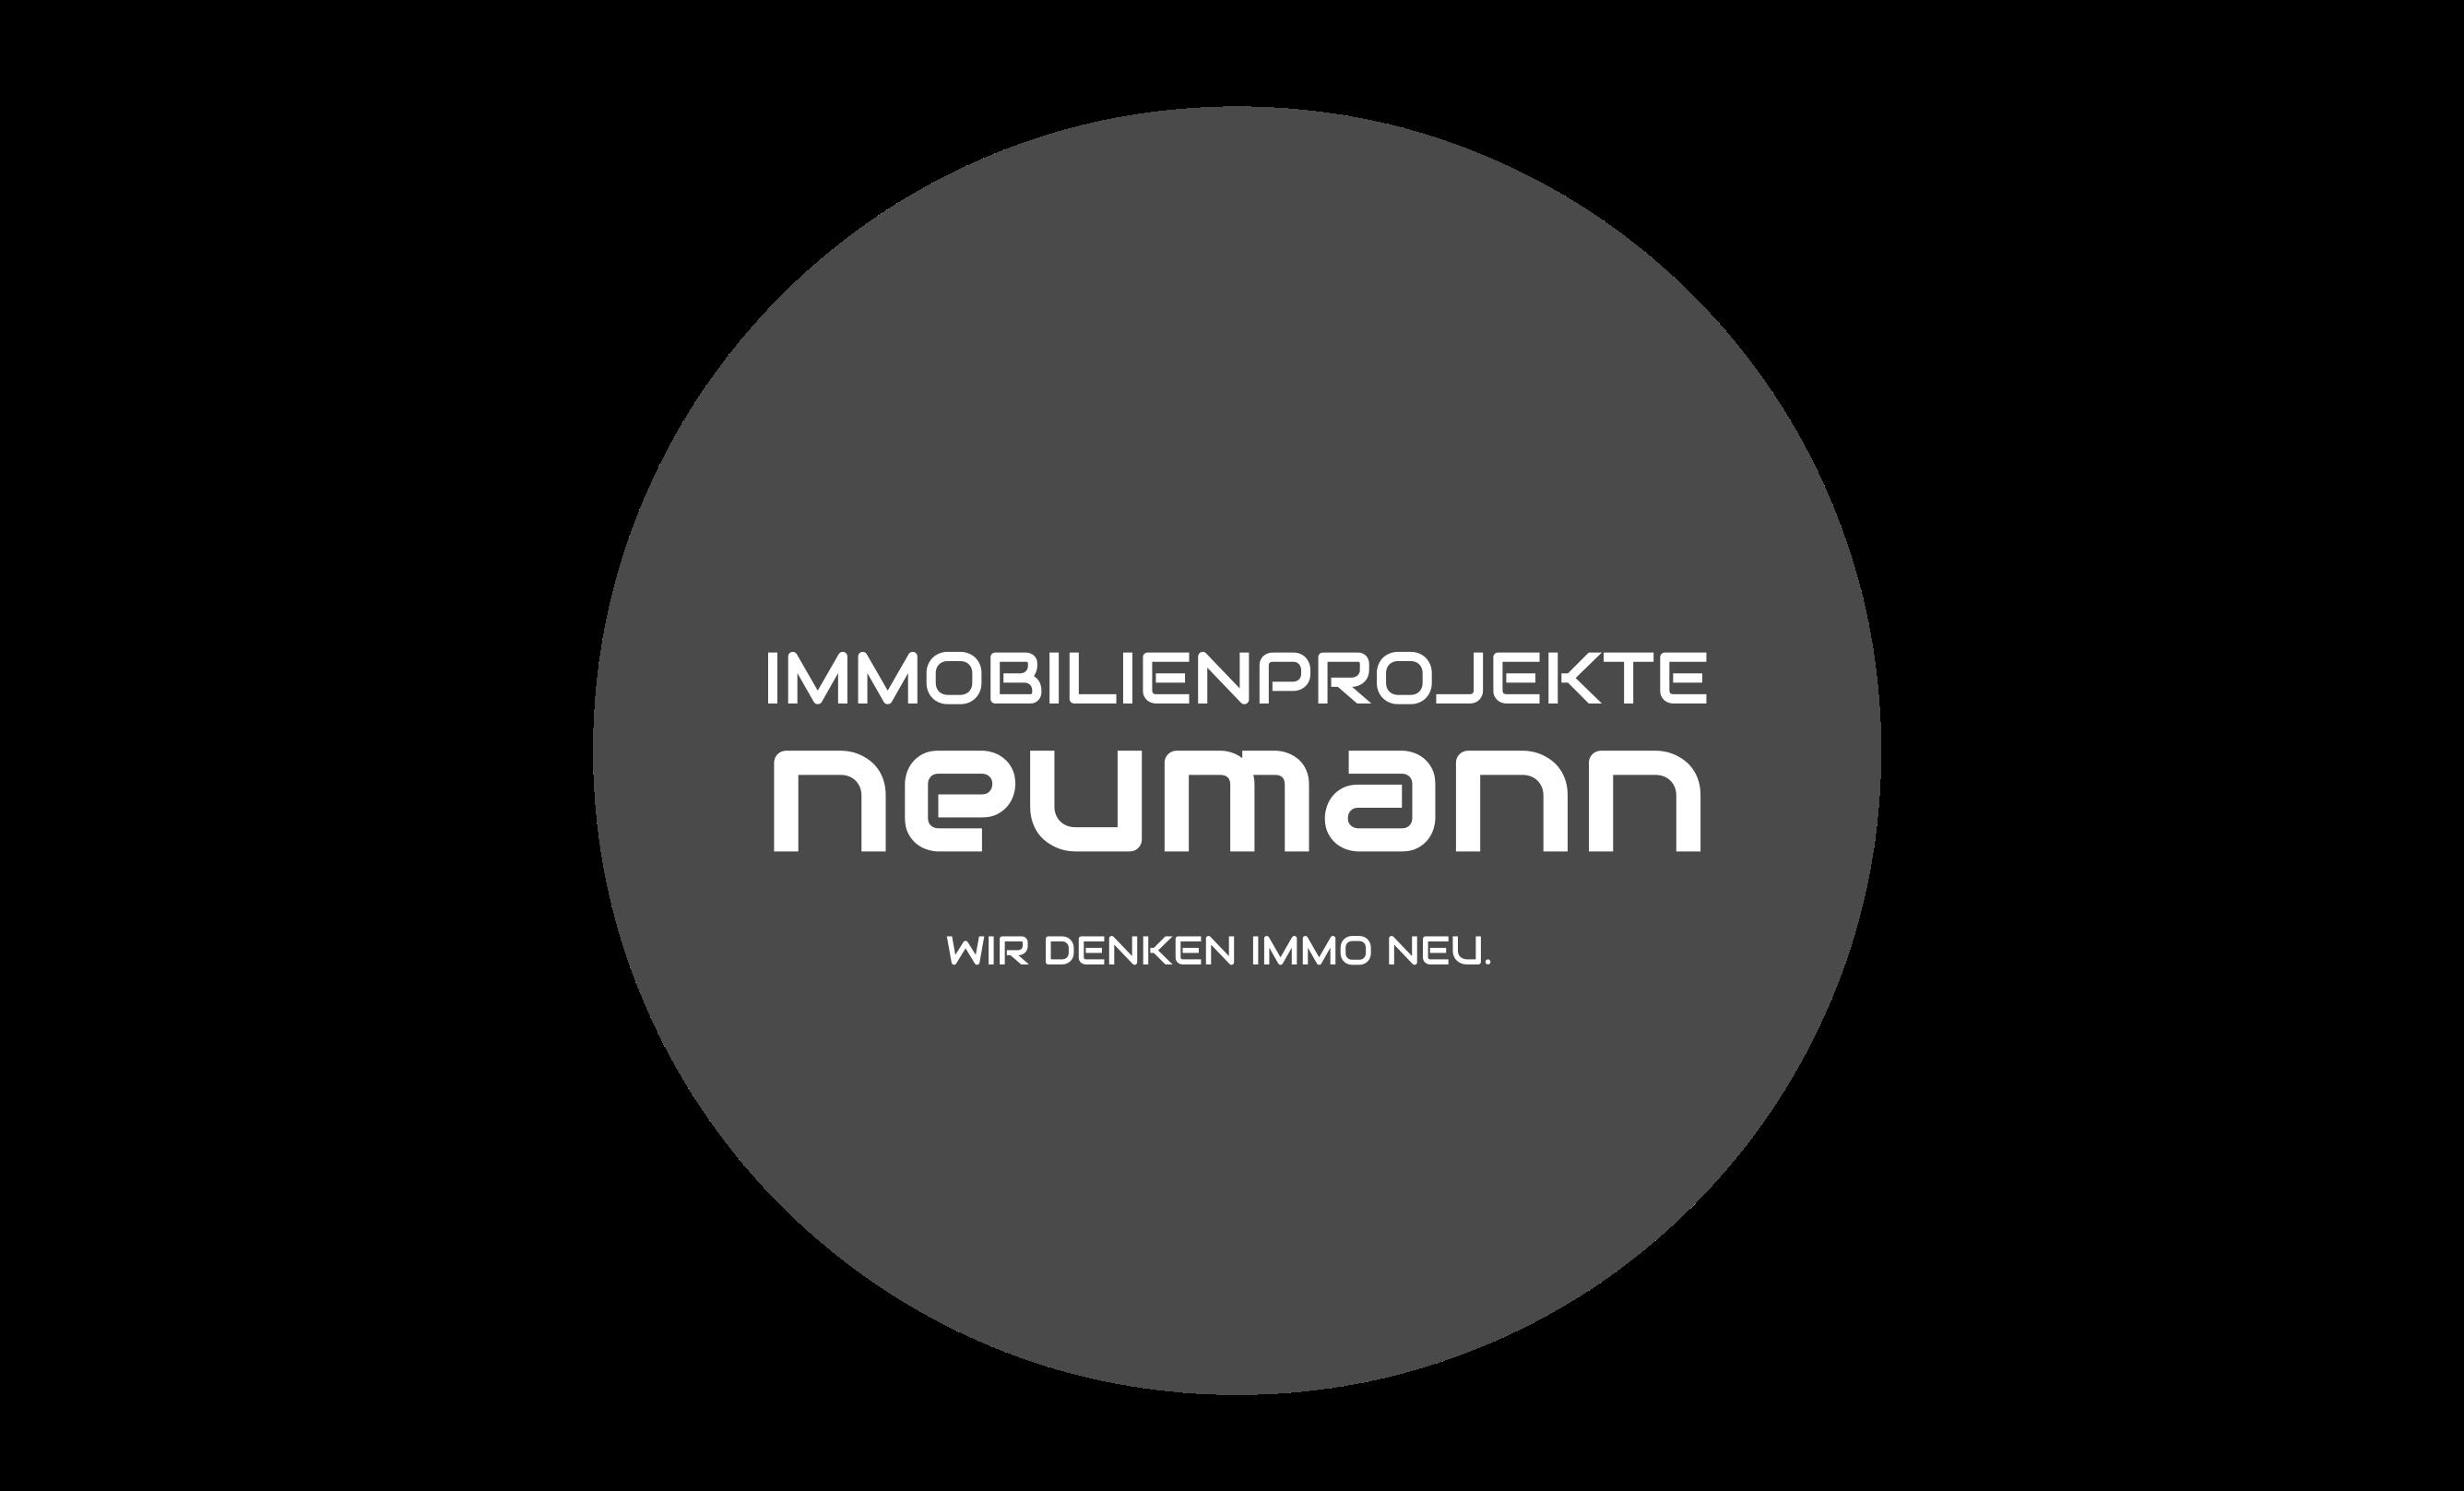 Immobilienprojekte Neumann